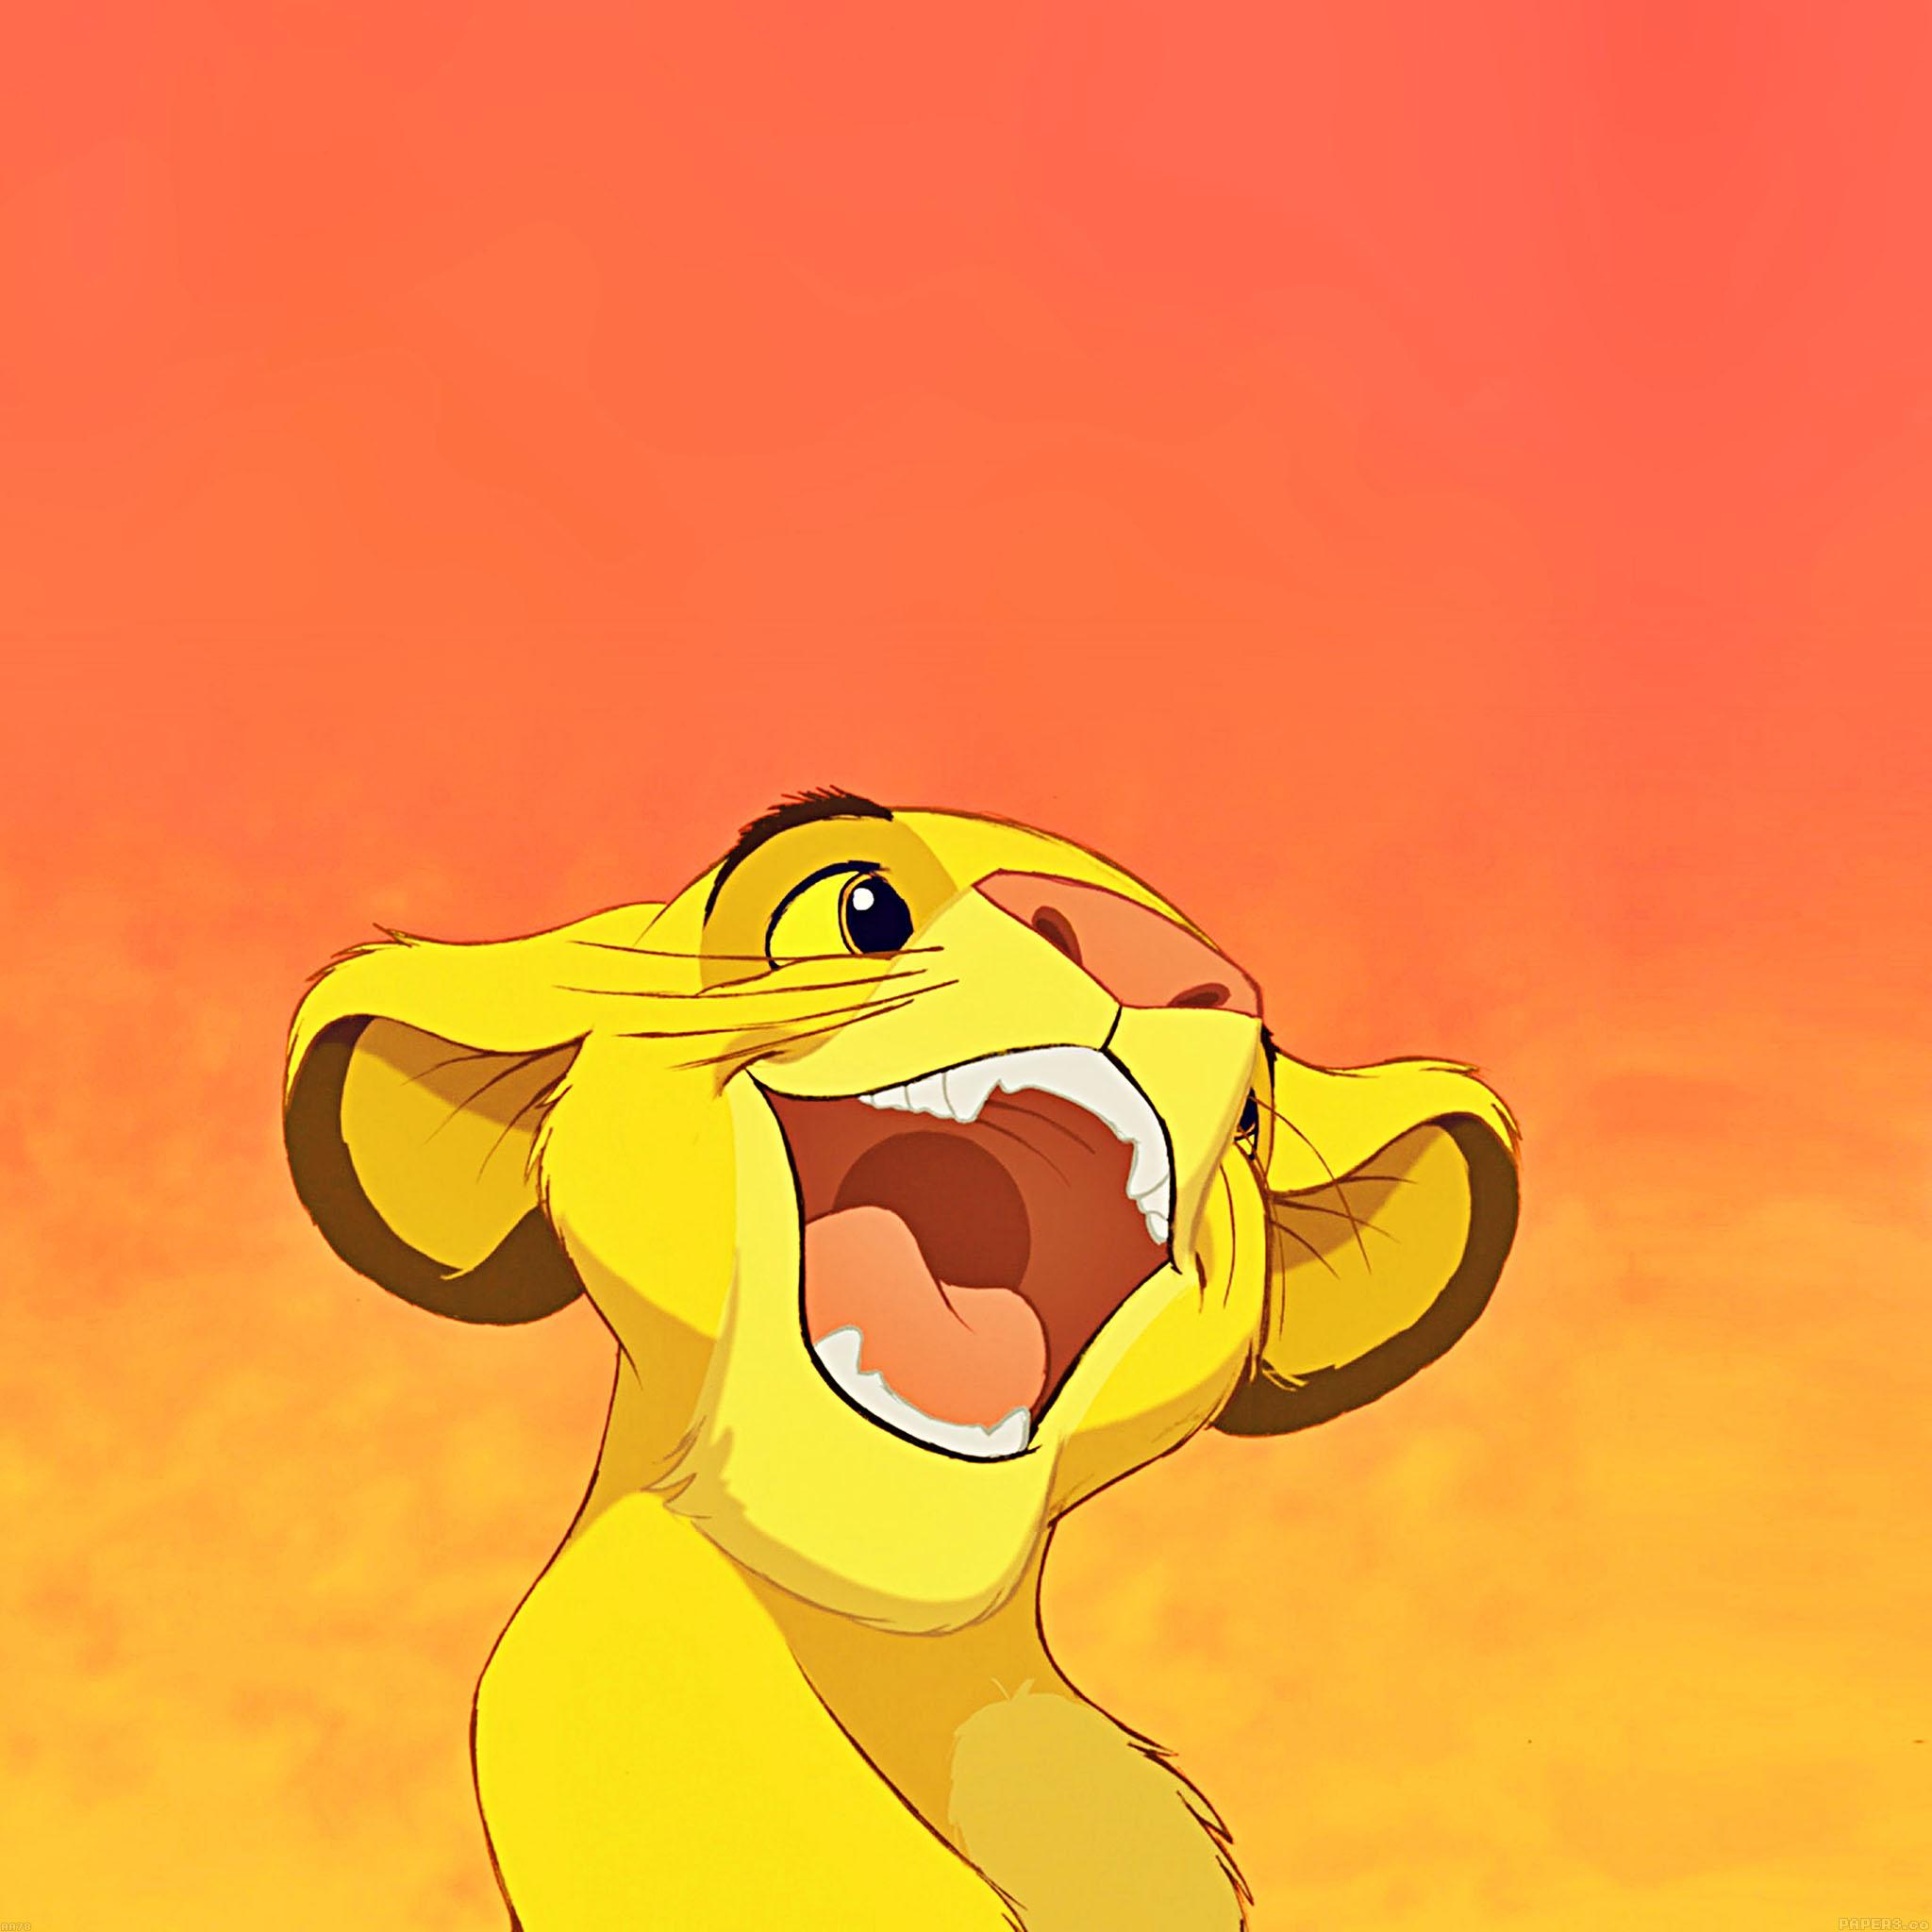 aa78-wallpaper-disney-simba-lionking-smile-illust - Papers.co